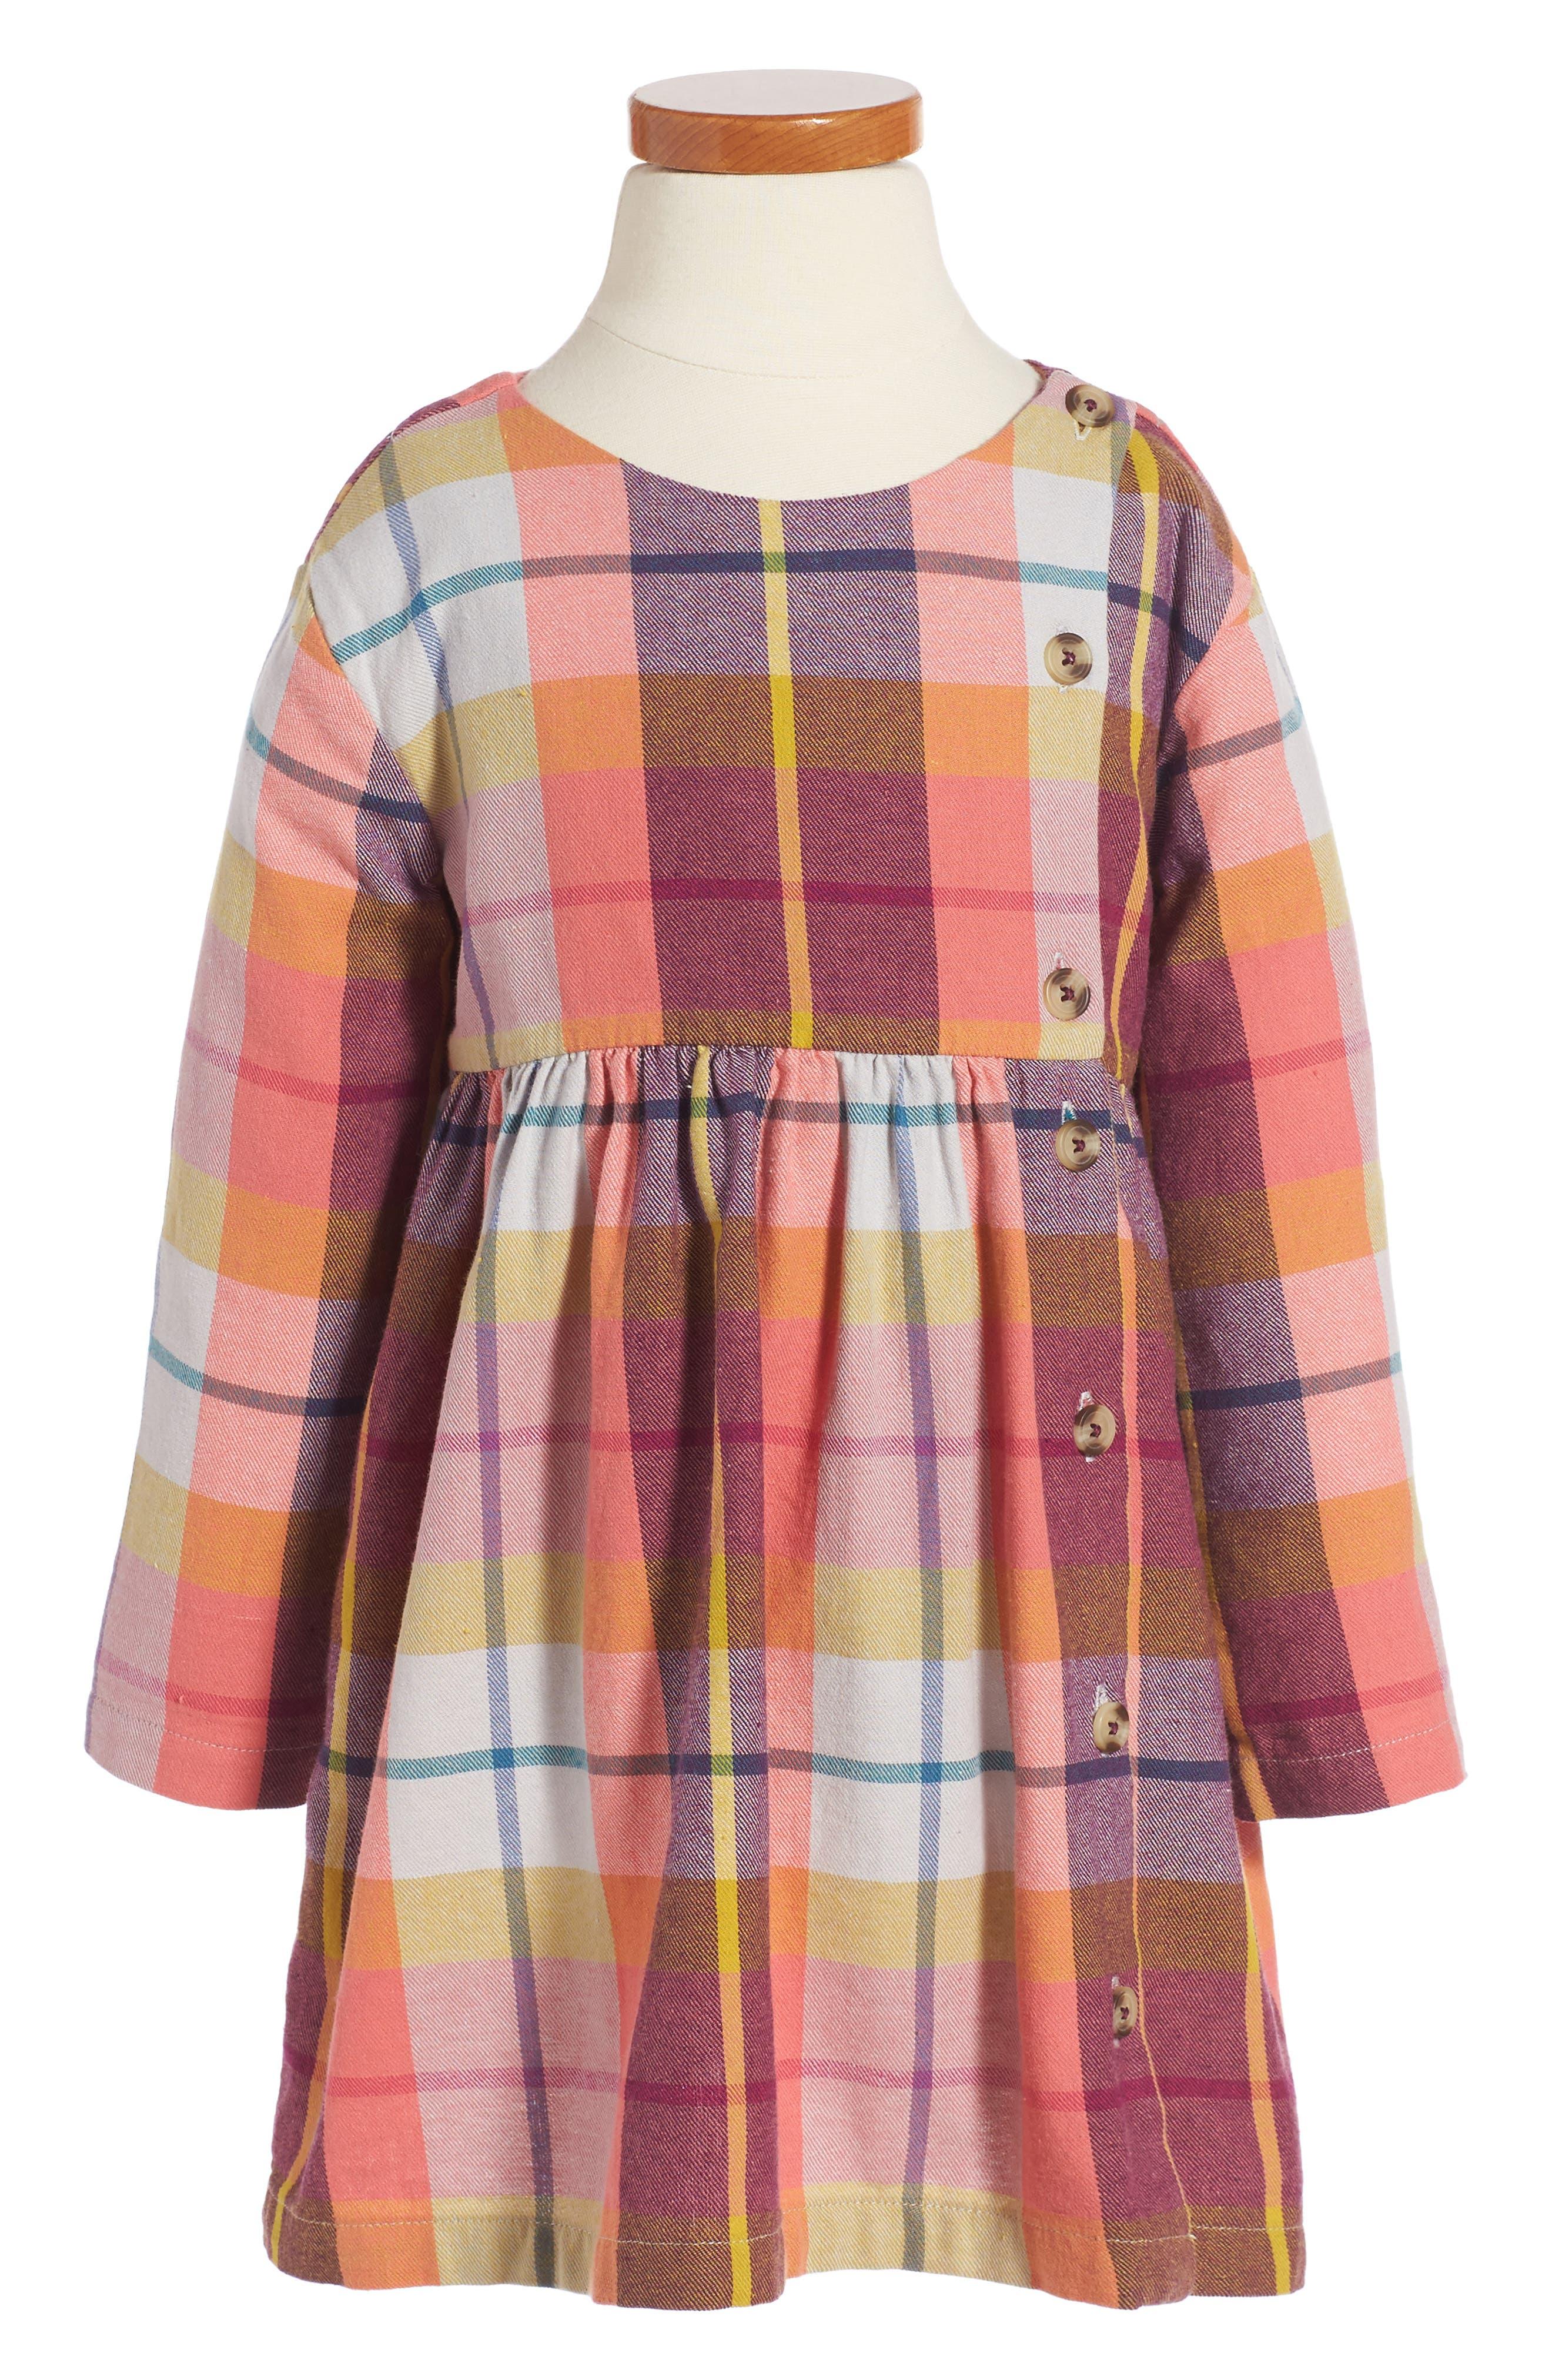 Alternate Image 1 Selected - Tea Collection Plaid Flannel Dress (Toddler Girls & Little Girls)